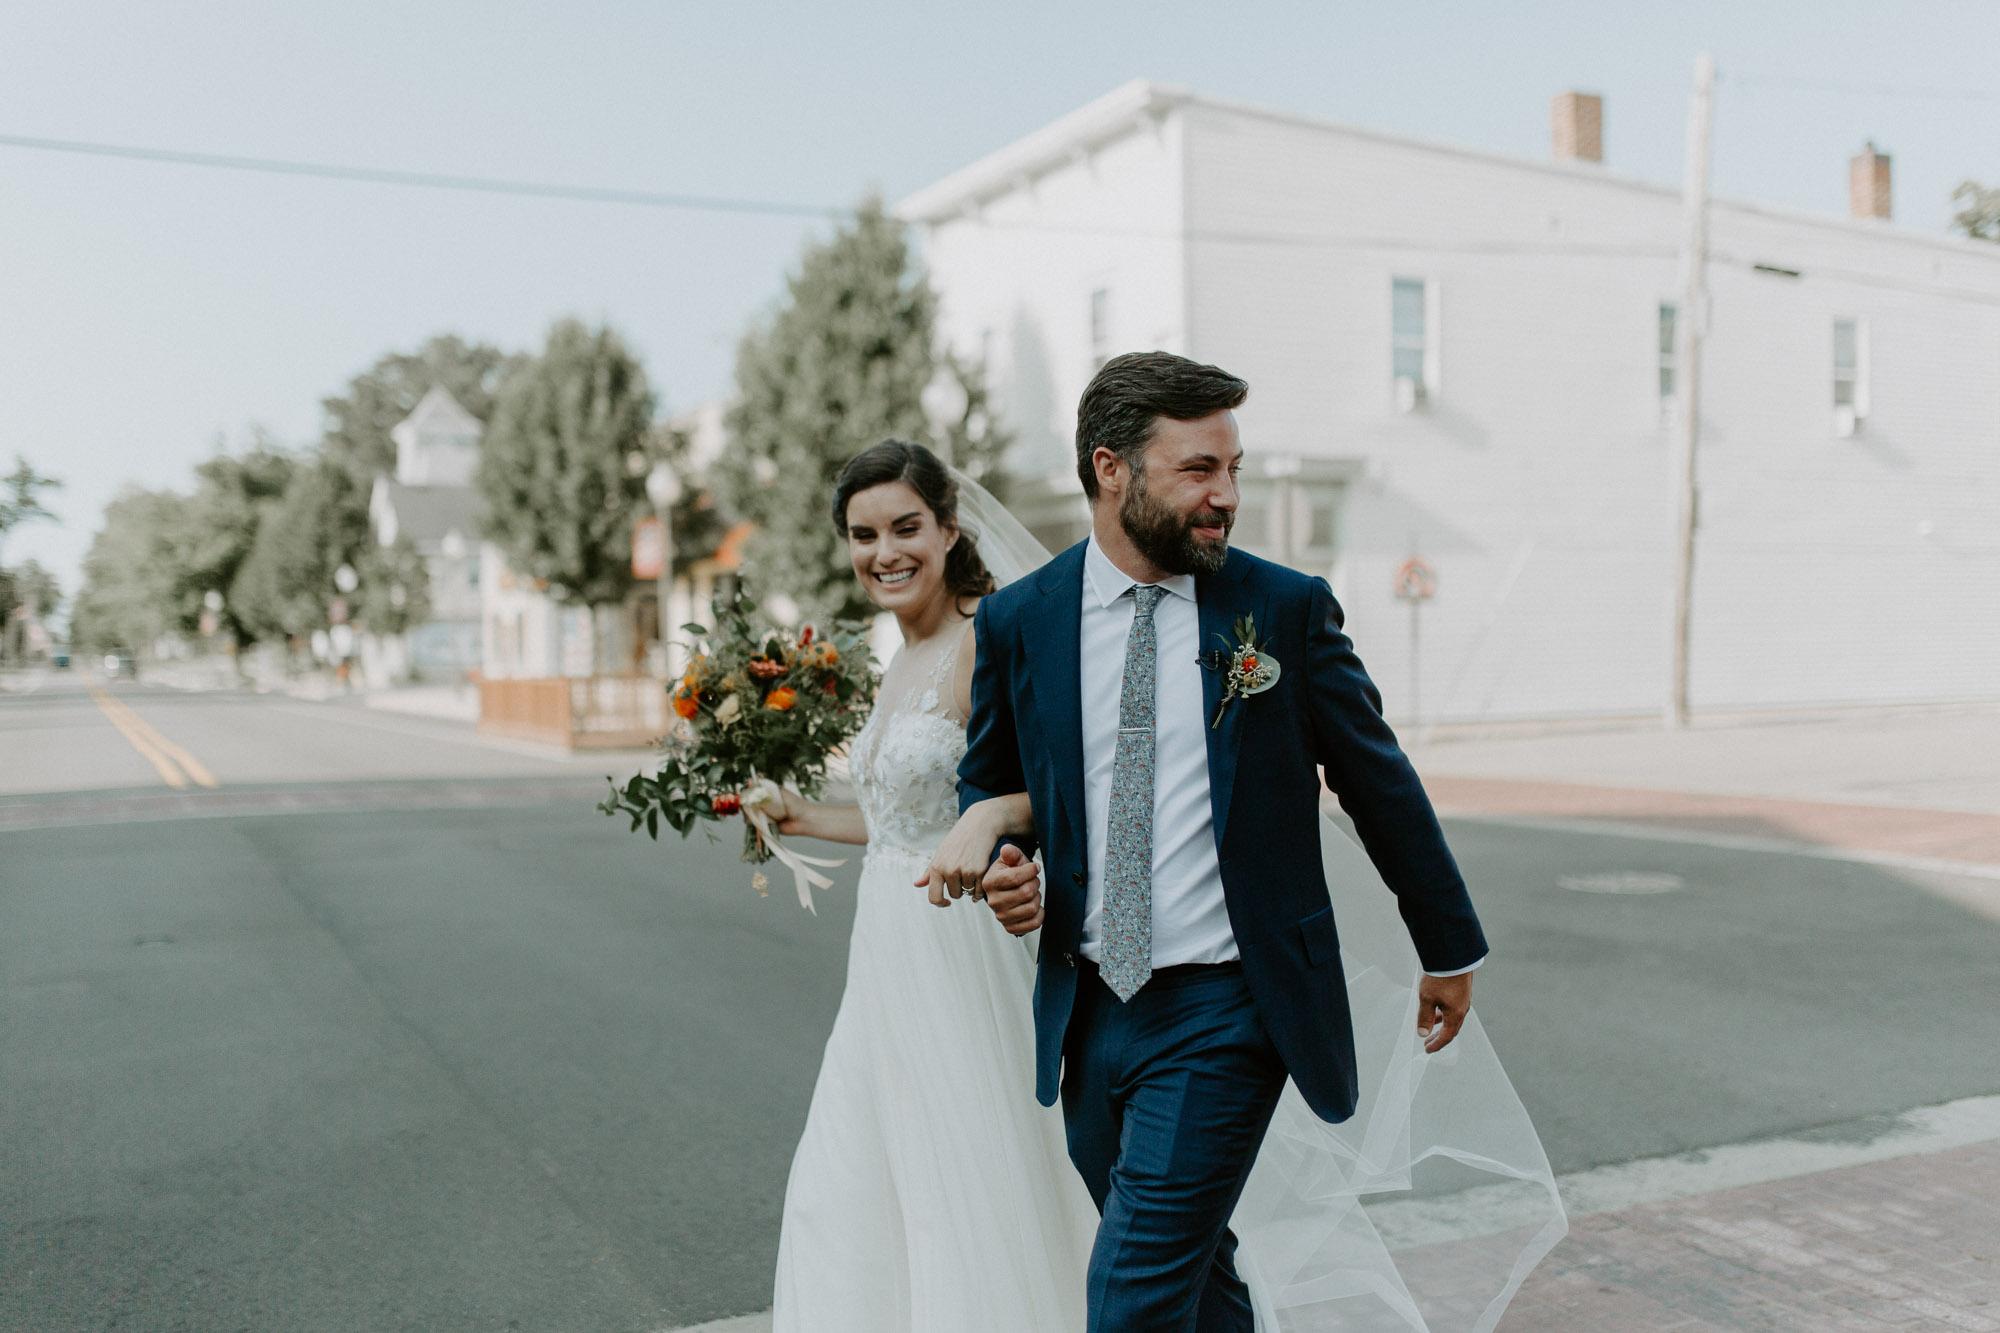 journeyman_distillery_wedding_photographer_chicago_il_wright_photographs-3958.jpg